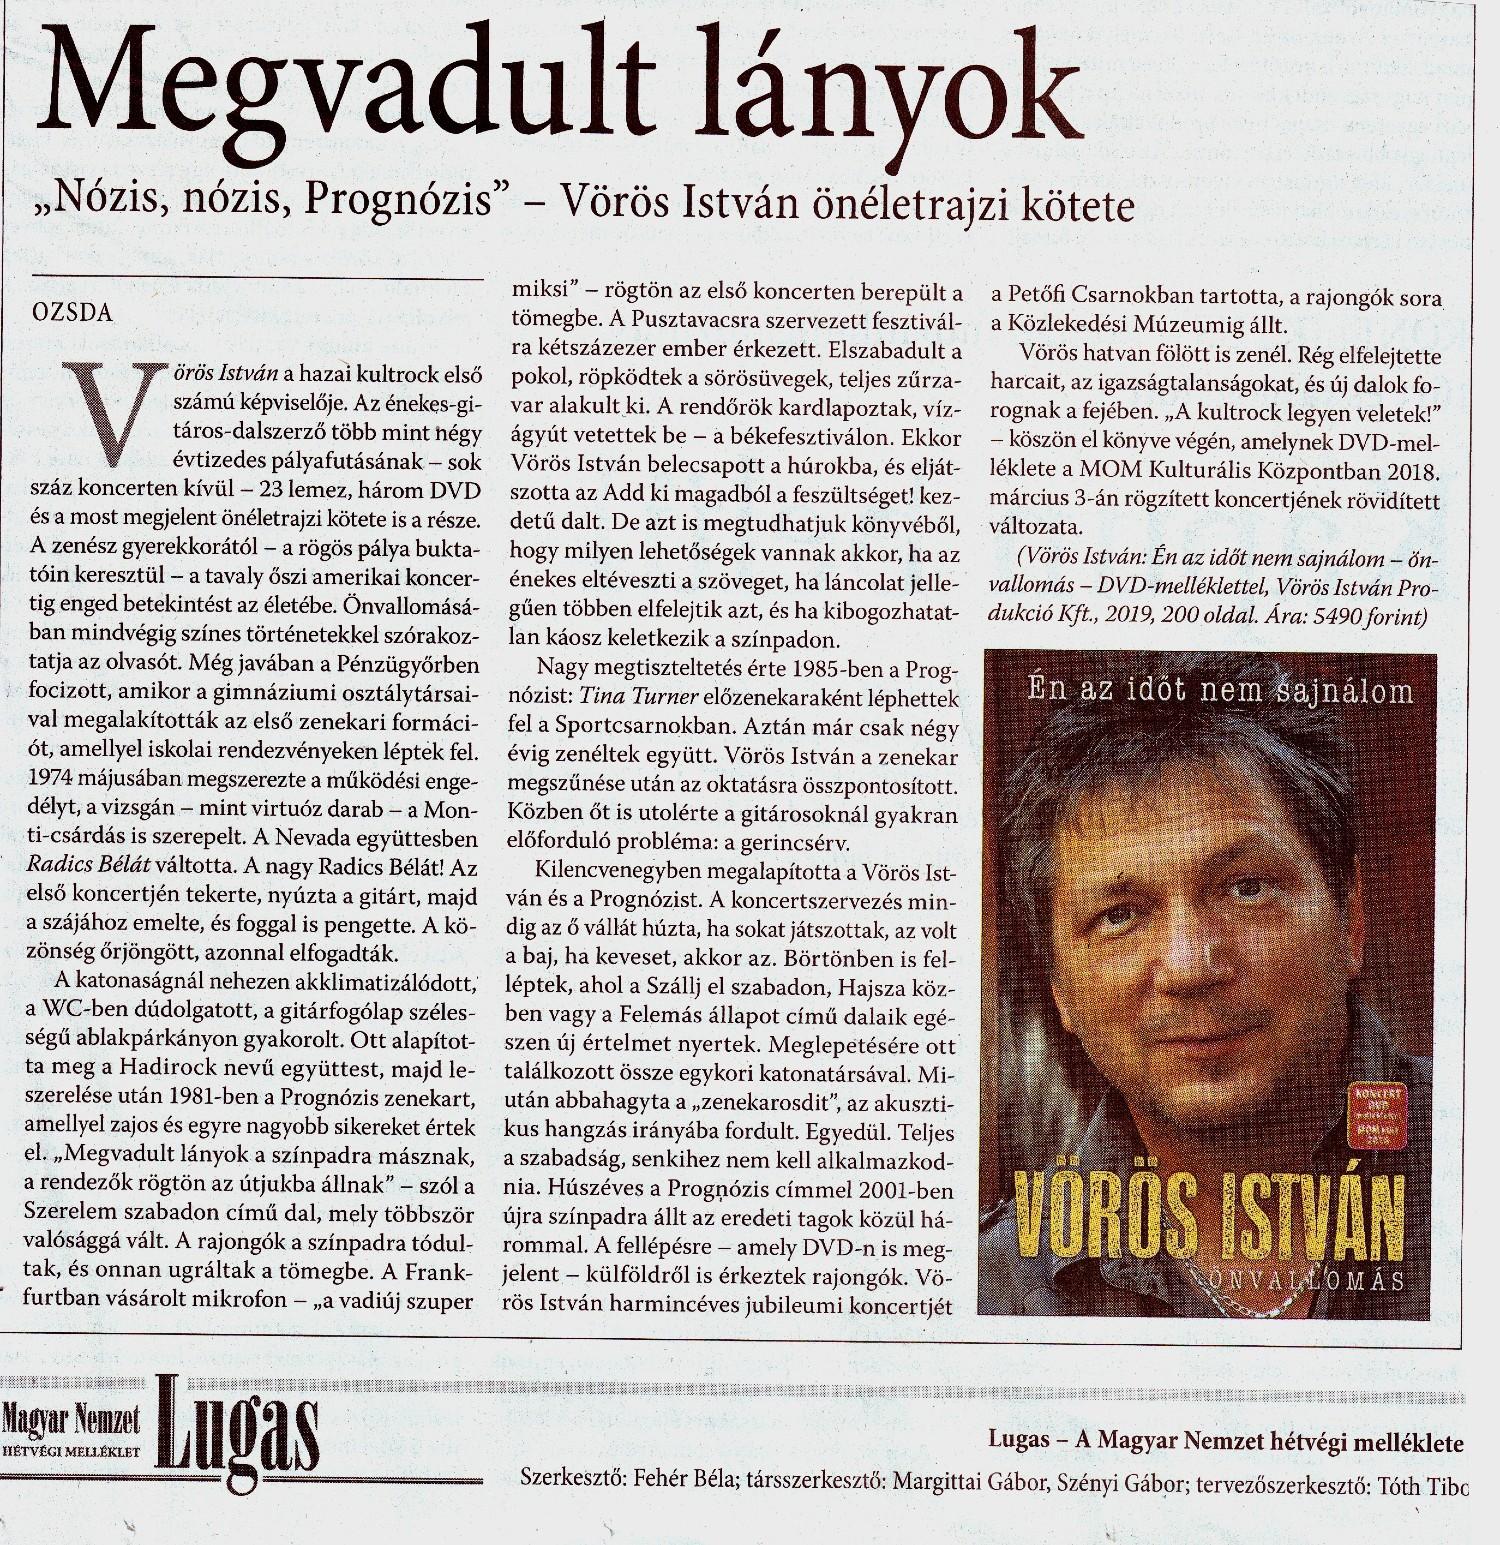 Magyar Nemzet cikk